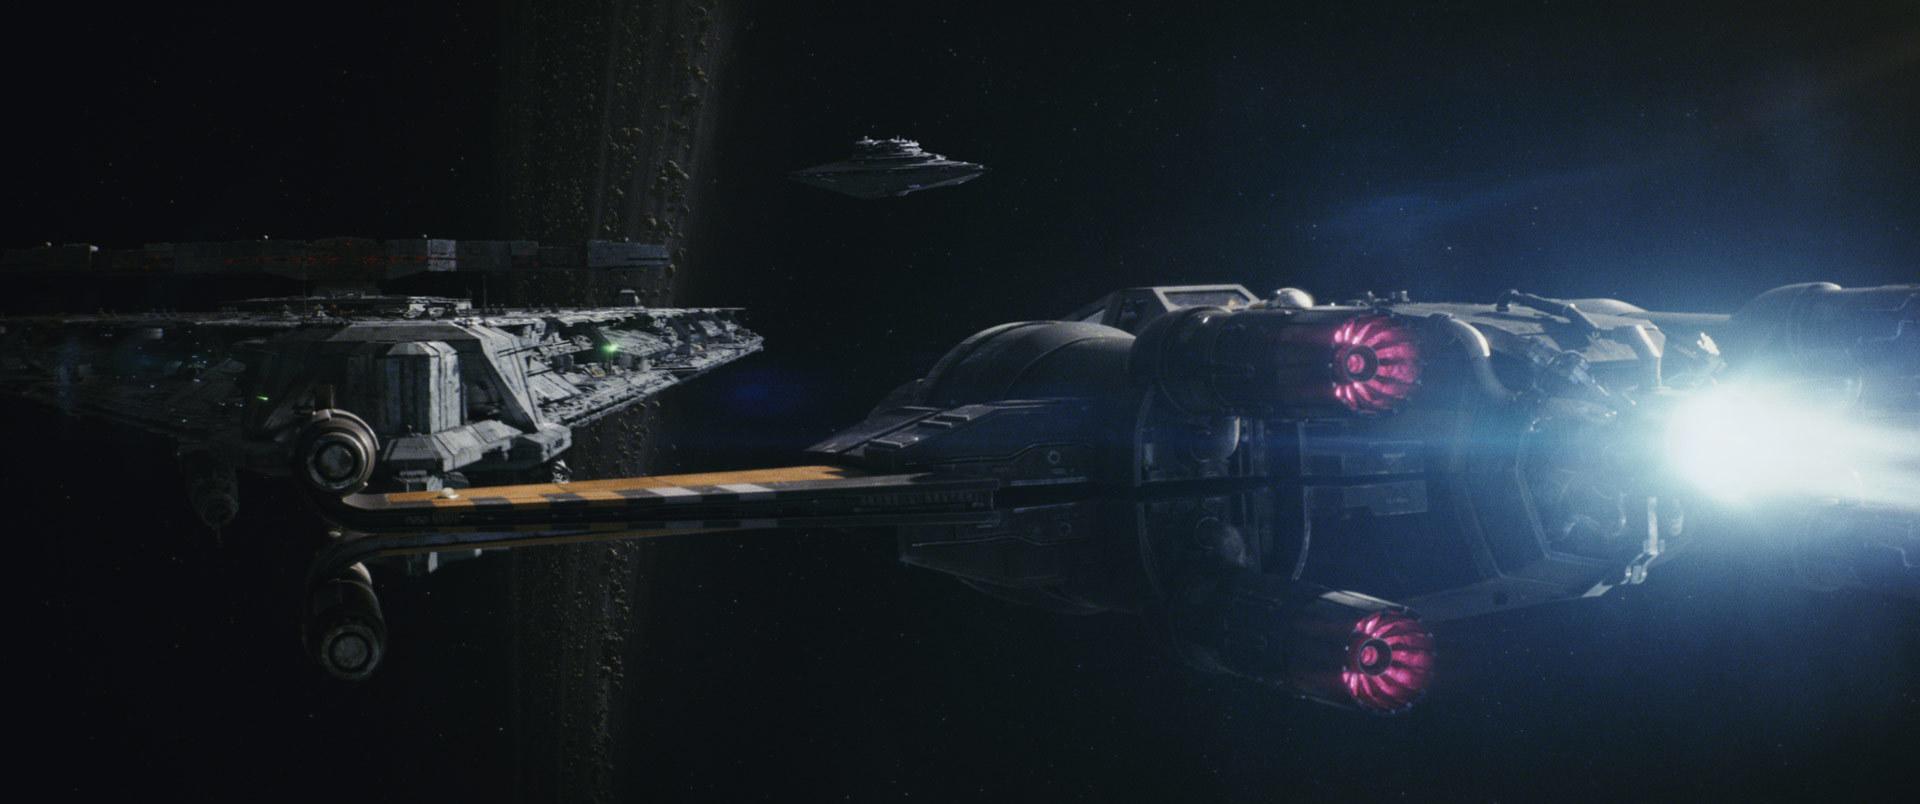 star-wars-the-last-jedi-poe-dreadnought